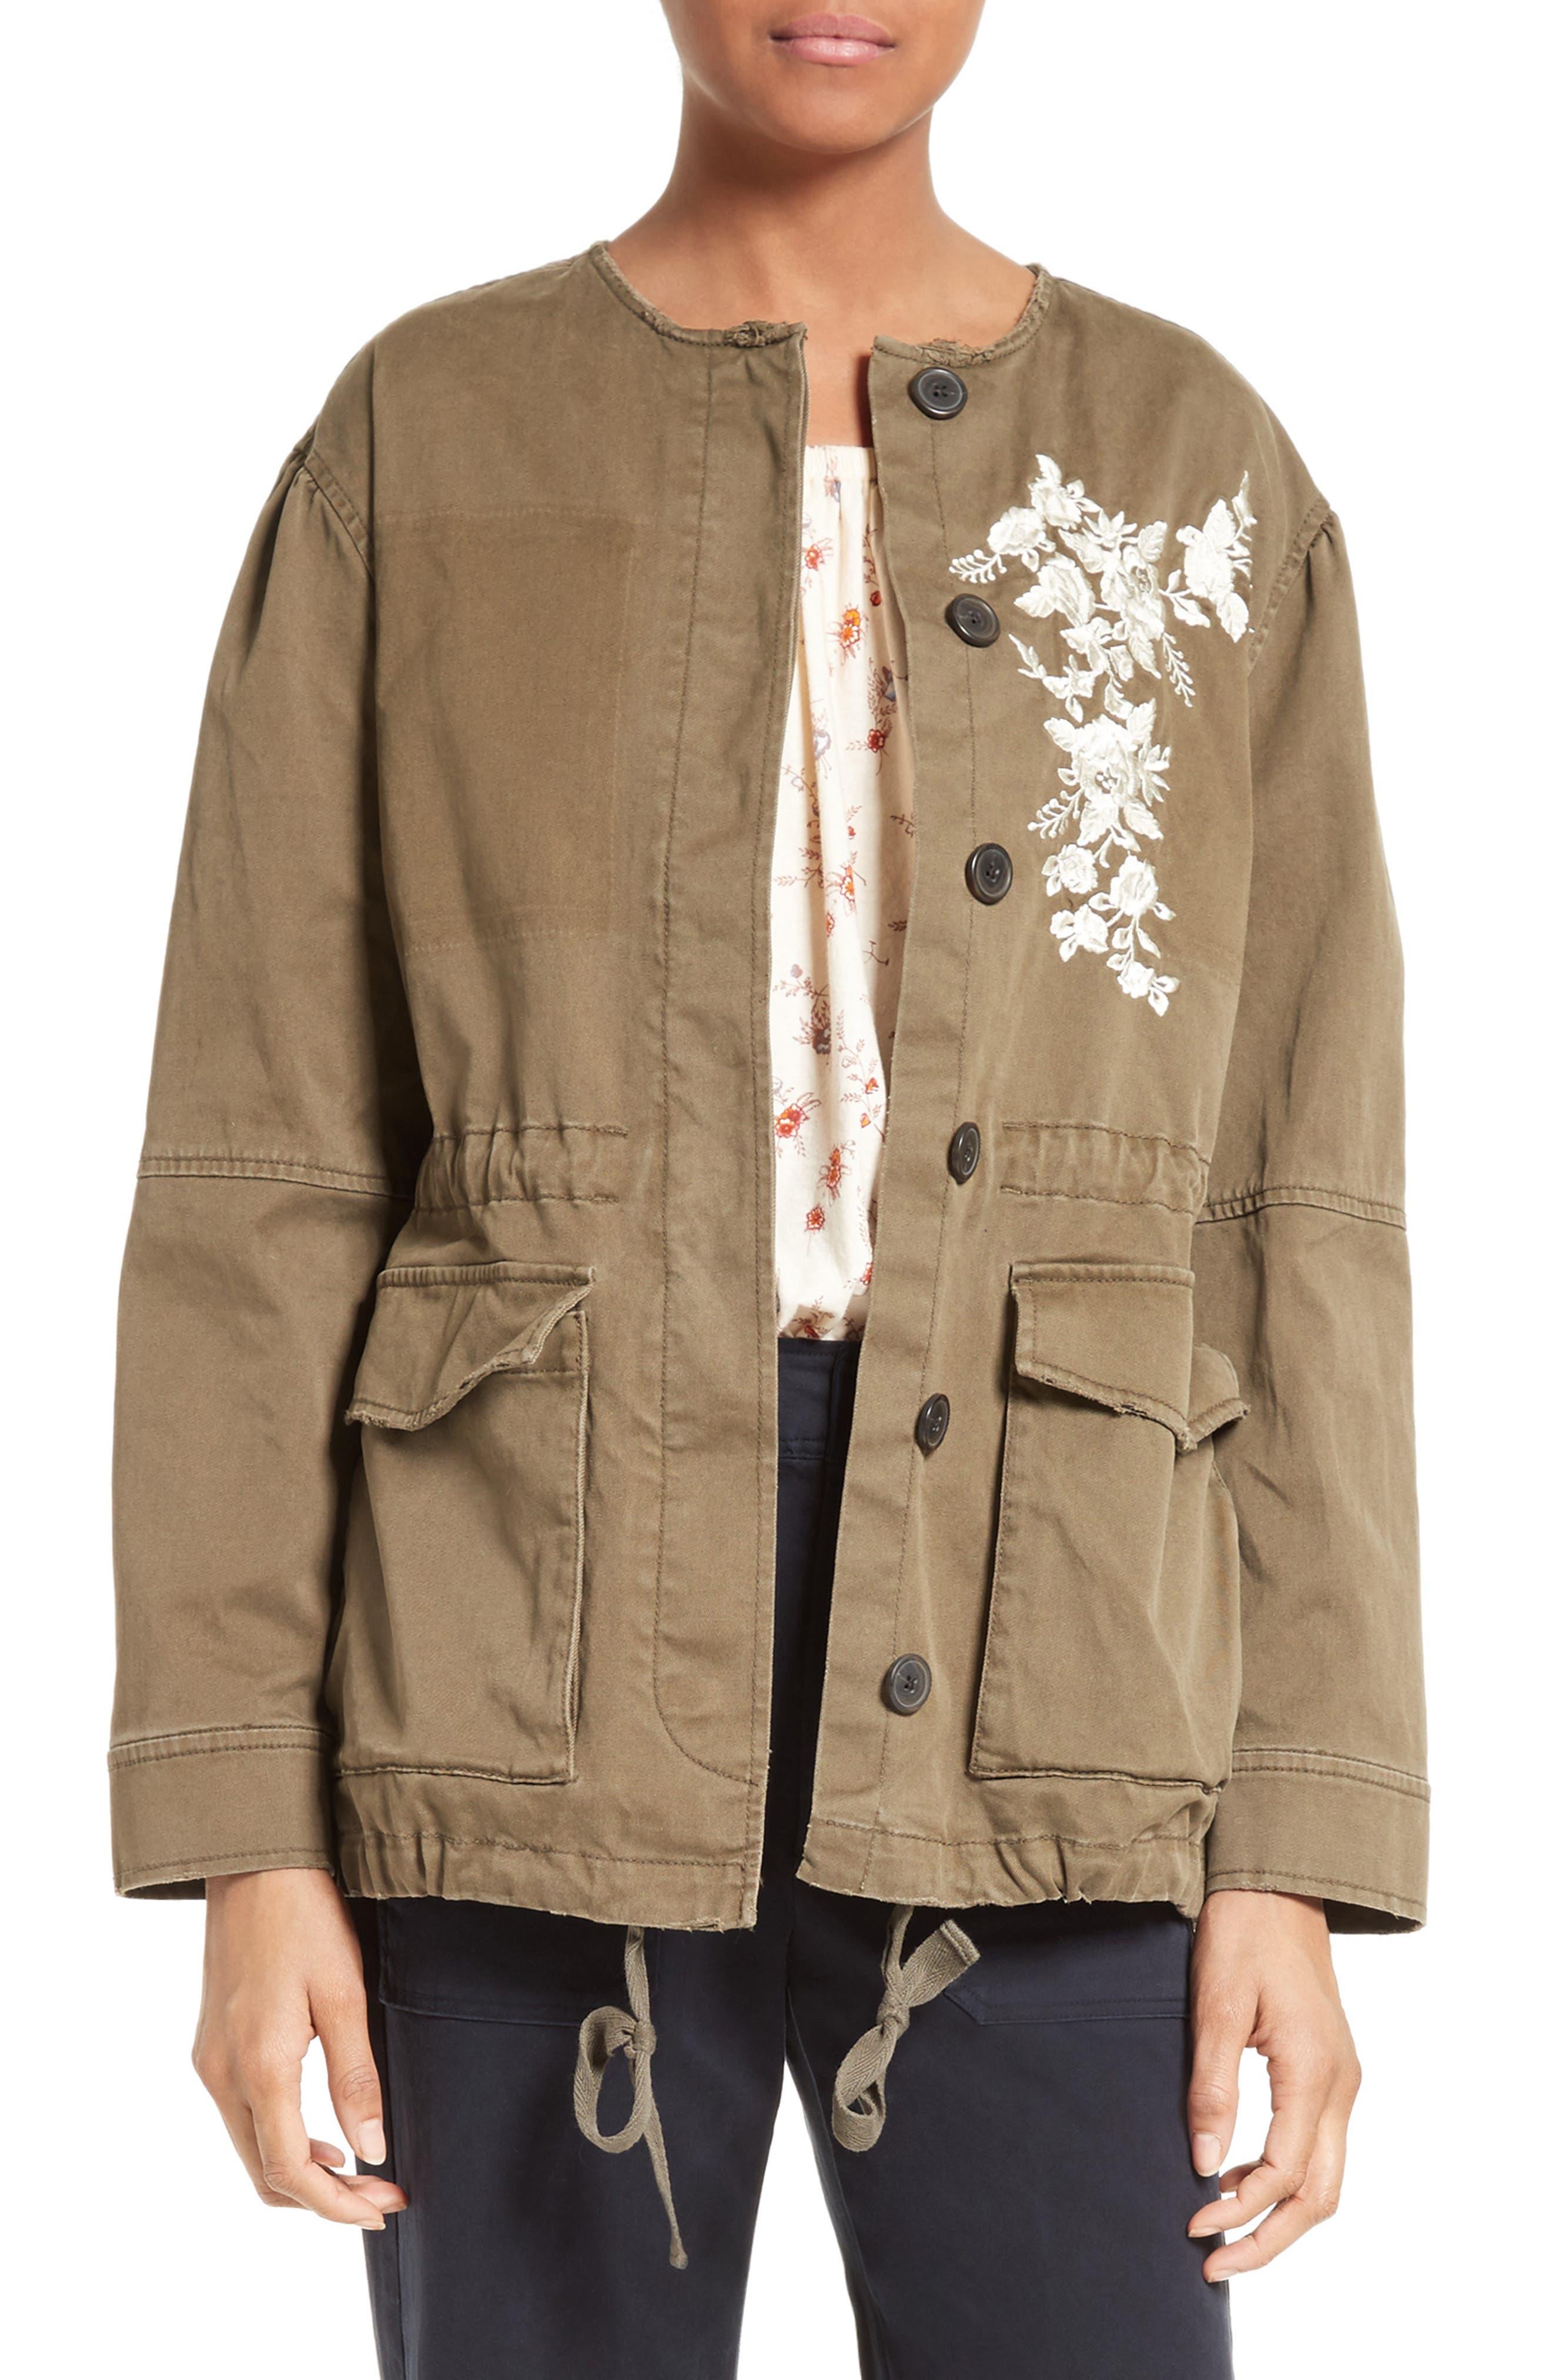 La Vie Rebecca Taylor Embroidered Stretch Twill Jacket